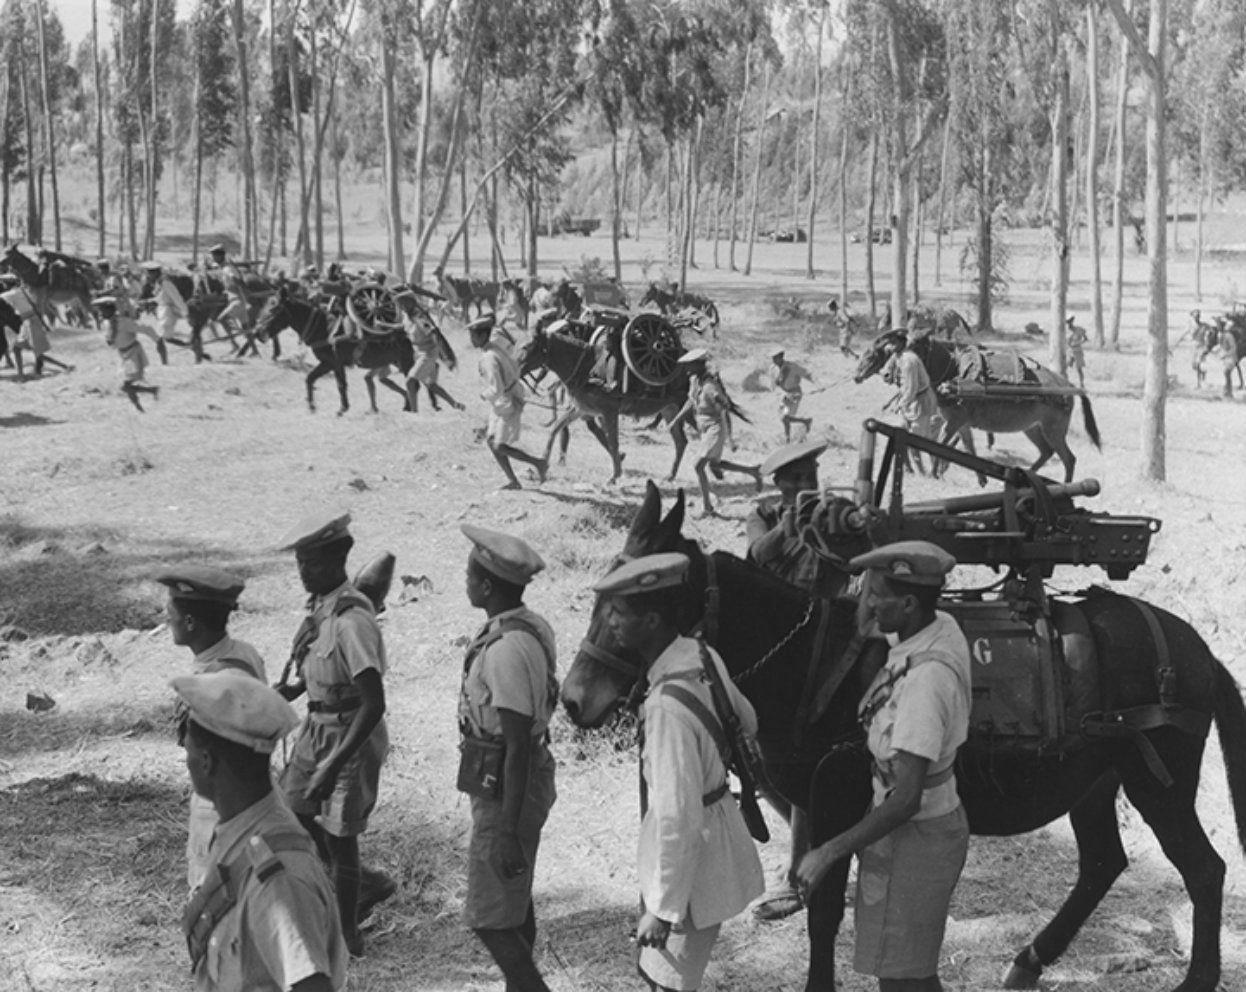 Anti Worlds Ethiopian Troops Transport Captured